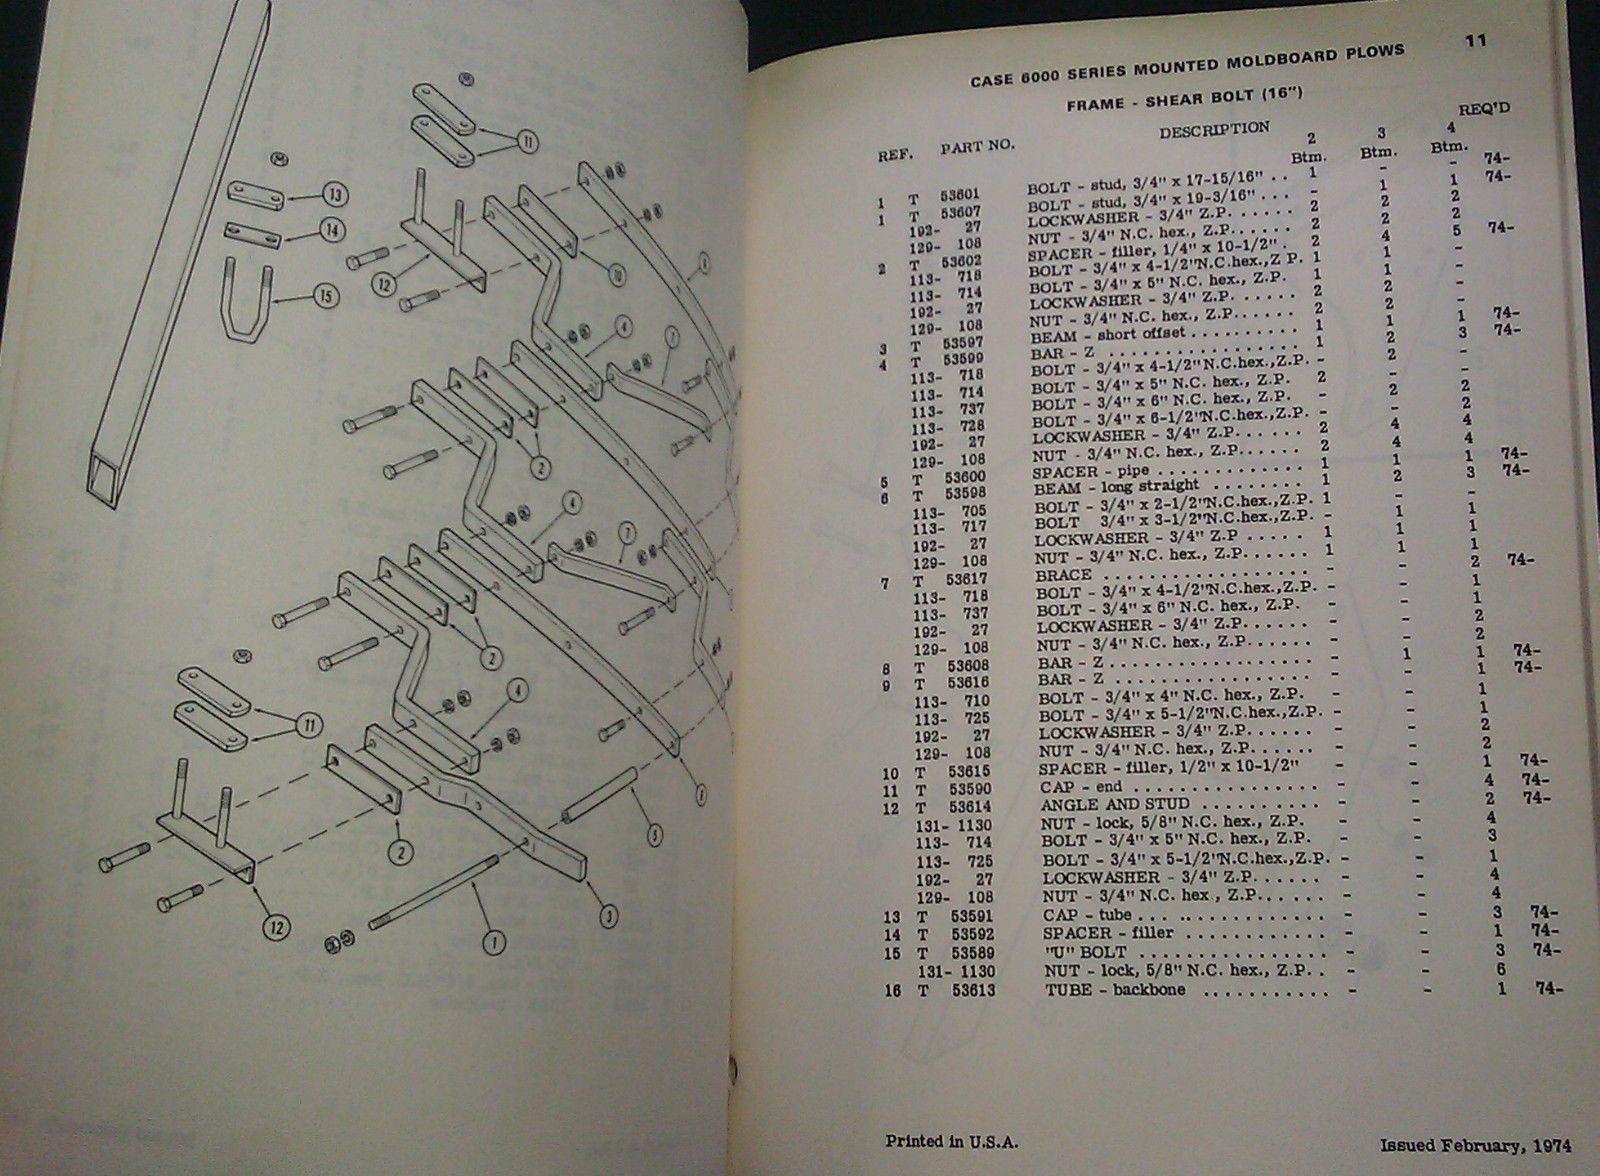 Mtd Parts Catalog : Vintage case series mtd moldboard plow parts catalog